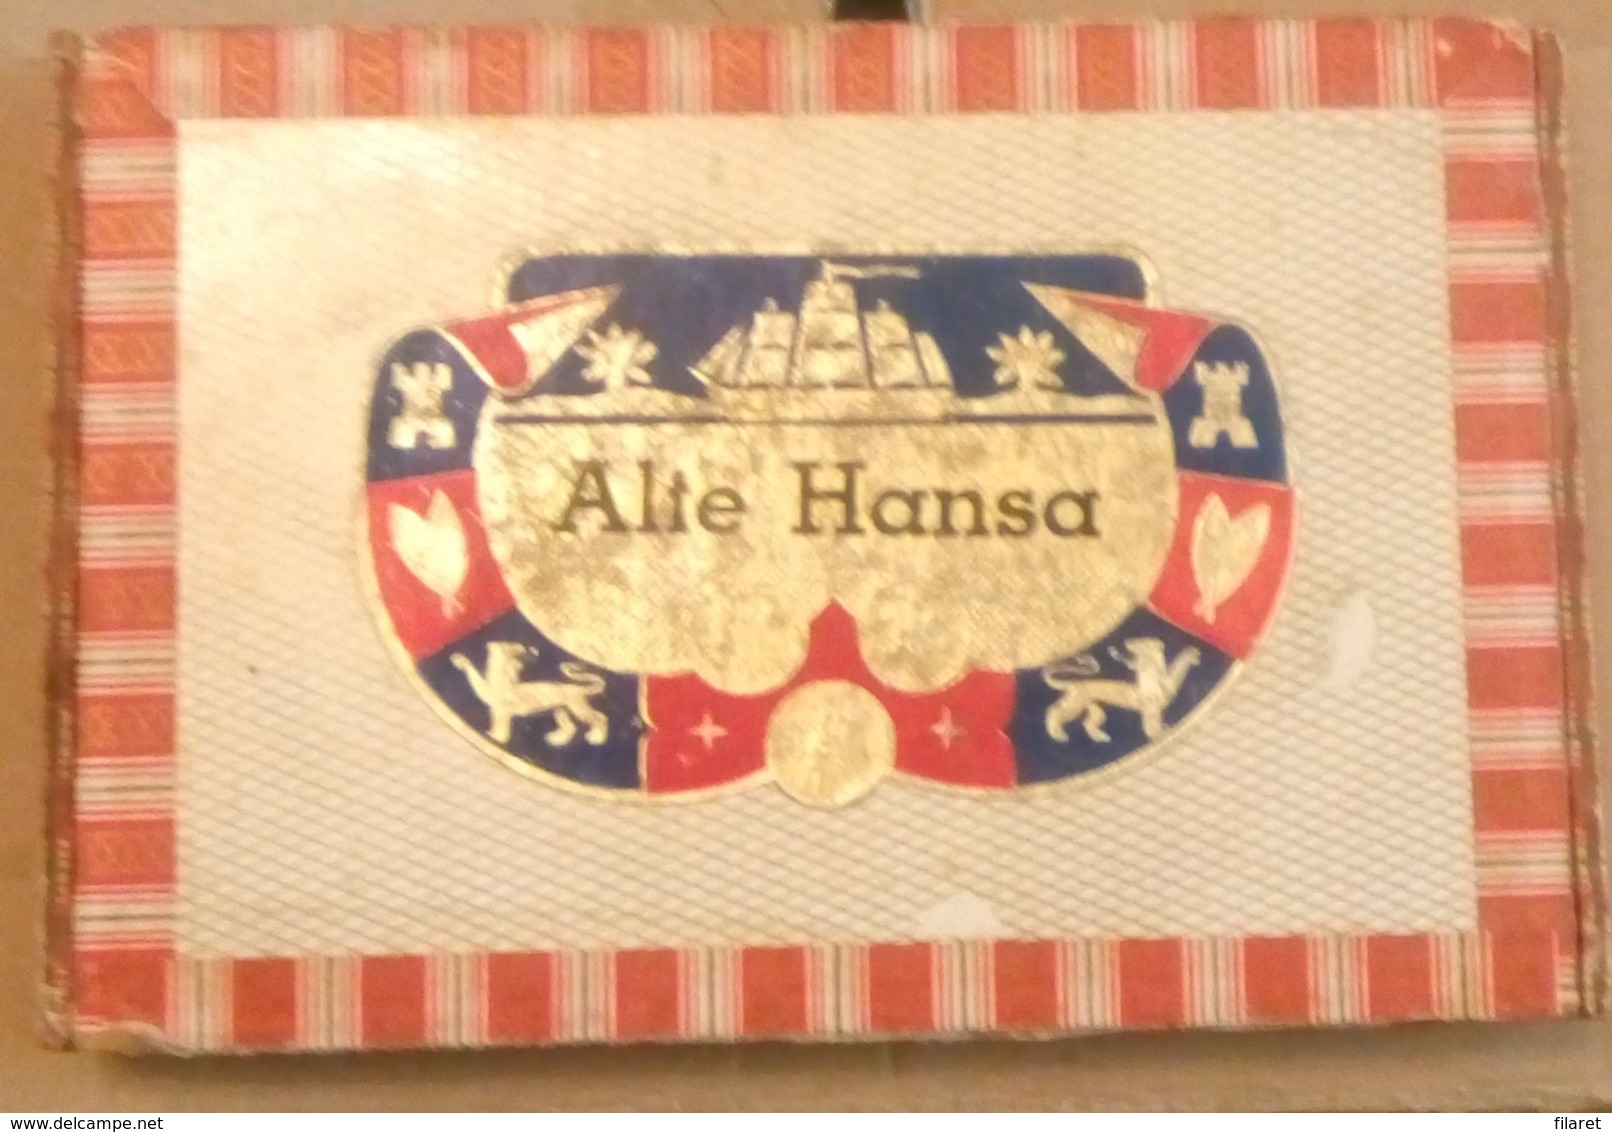 ALTE HANSA SHIPPMENT-SHIPS AT SEA, SAILORS-,OLD  CIGARS BOX,EMPTY - Zigarrenetuis